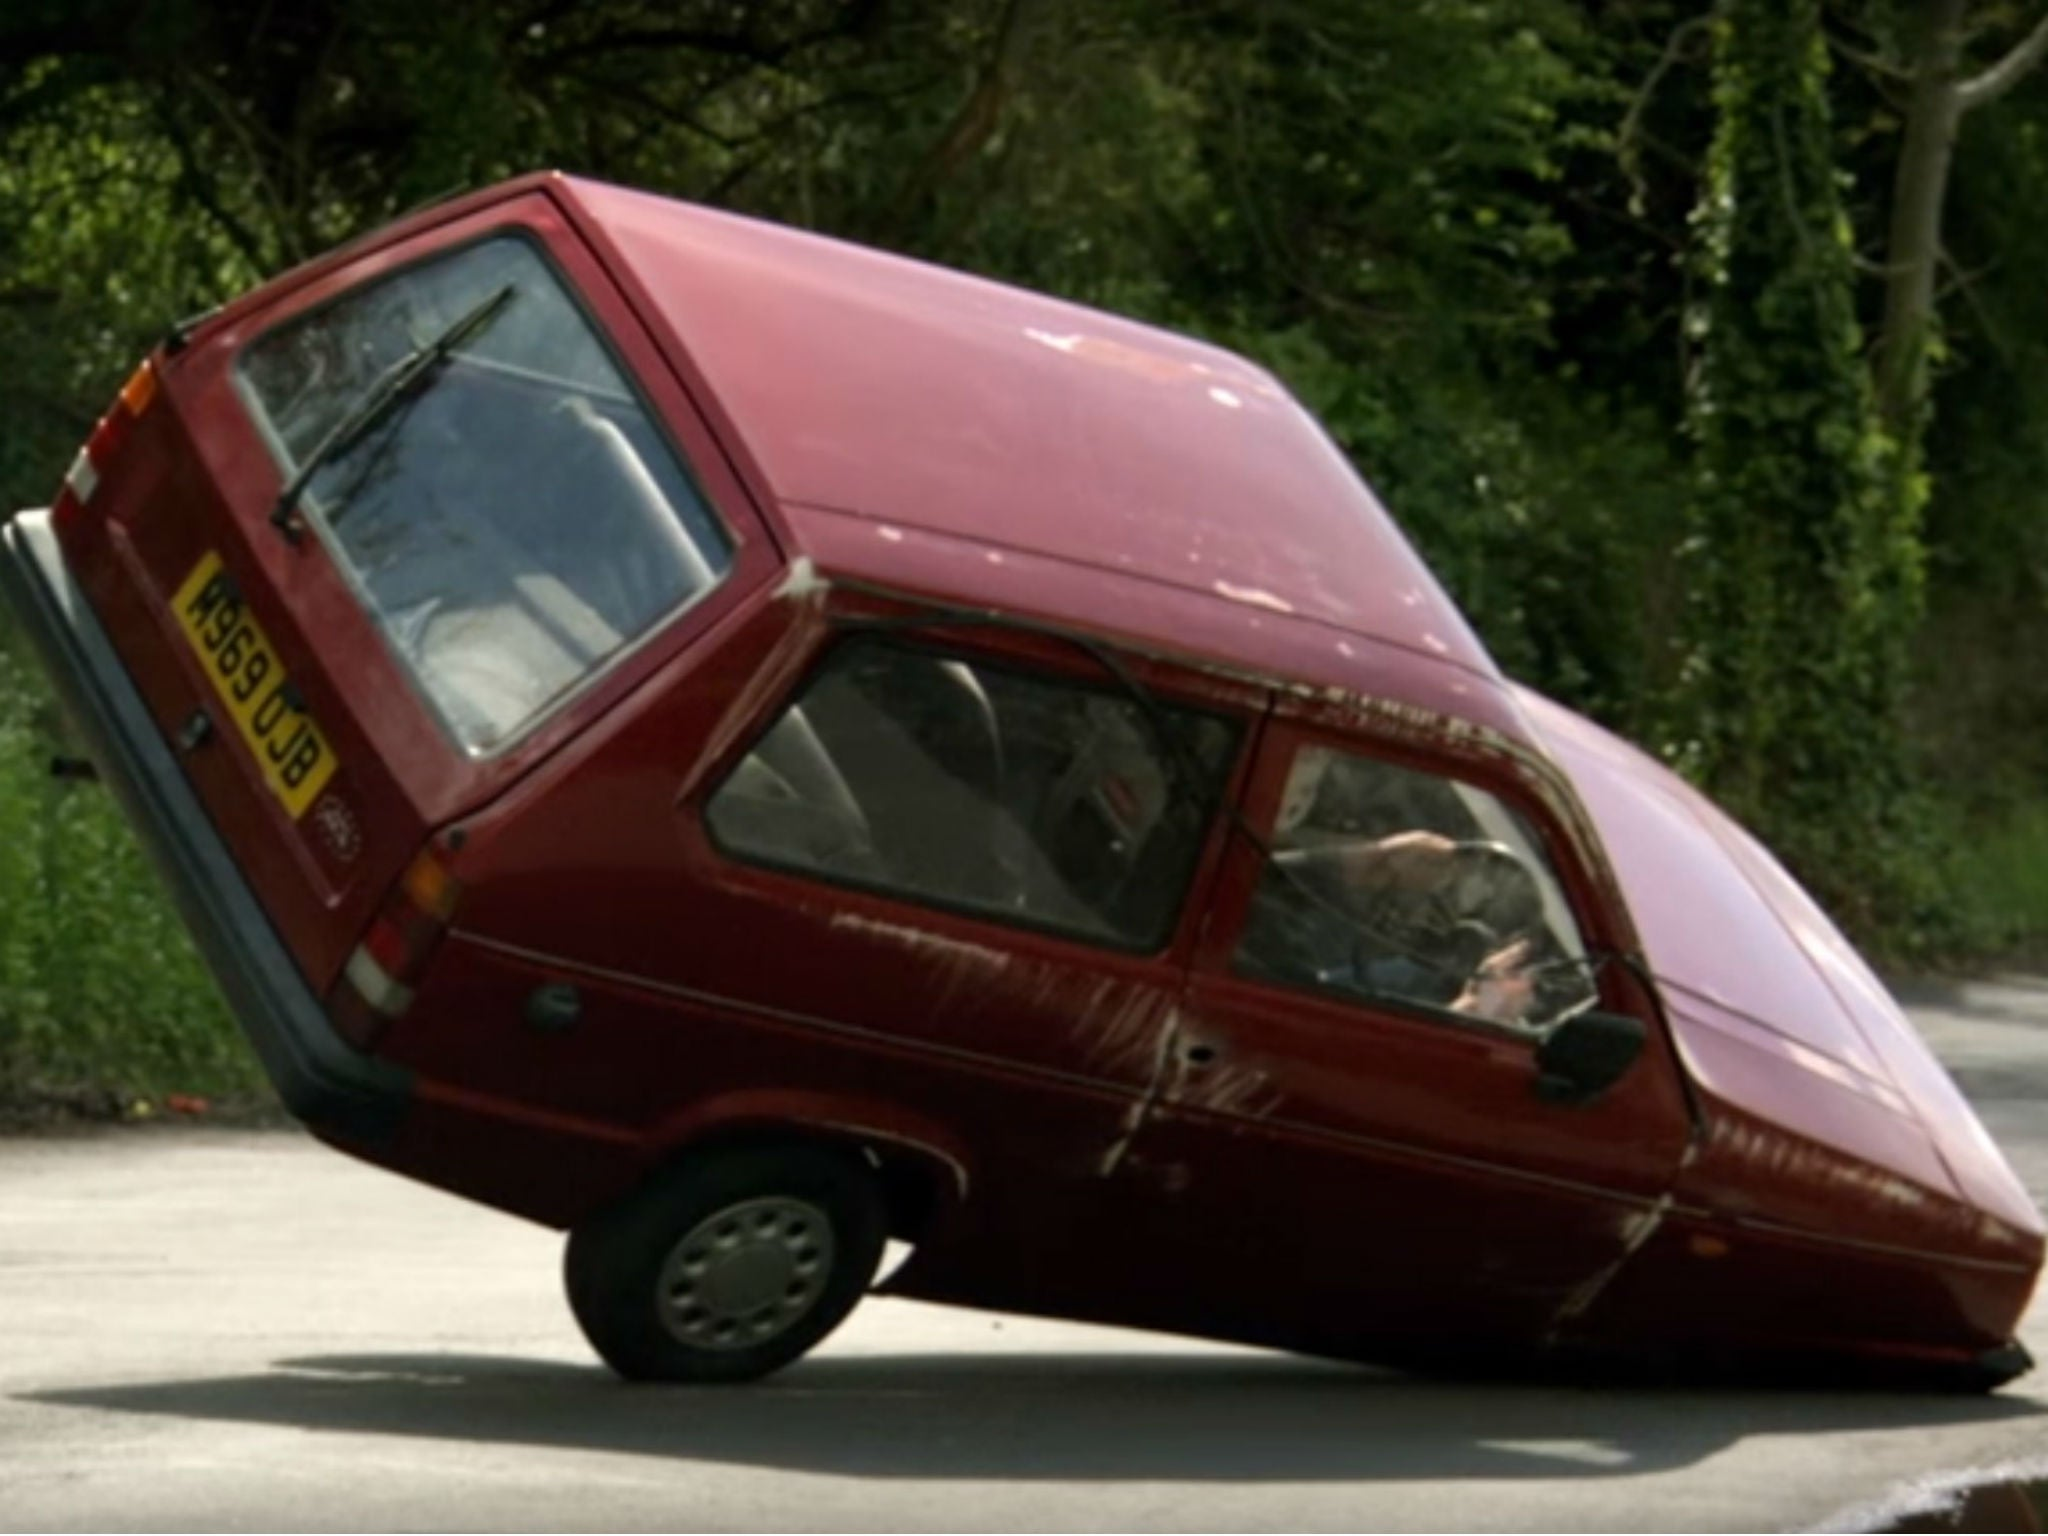 Top Gear Jeremy Clarkson Reveals He Faked Famous Reliant